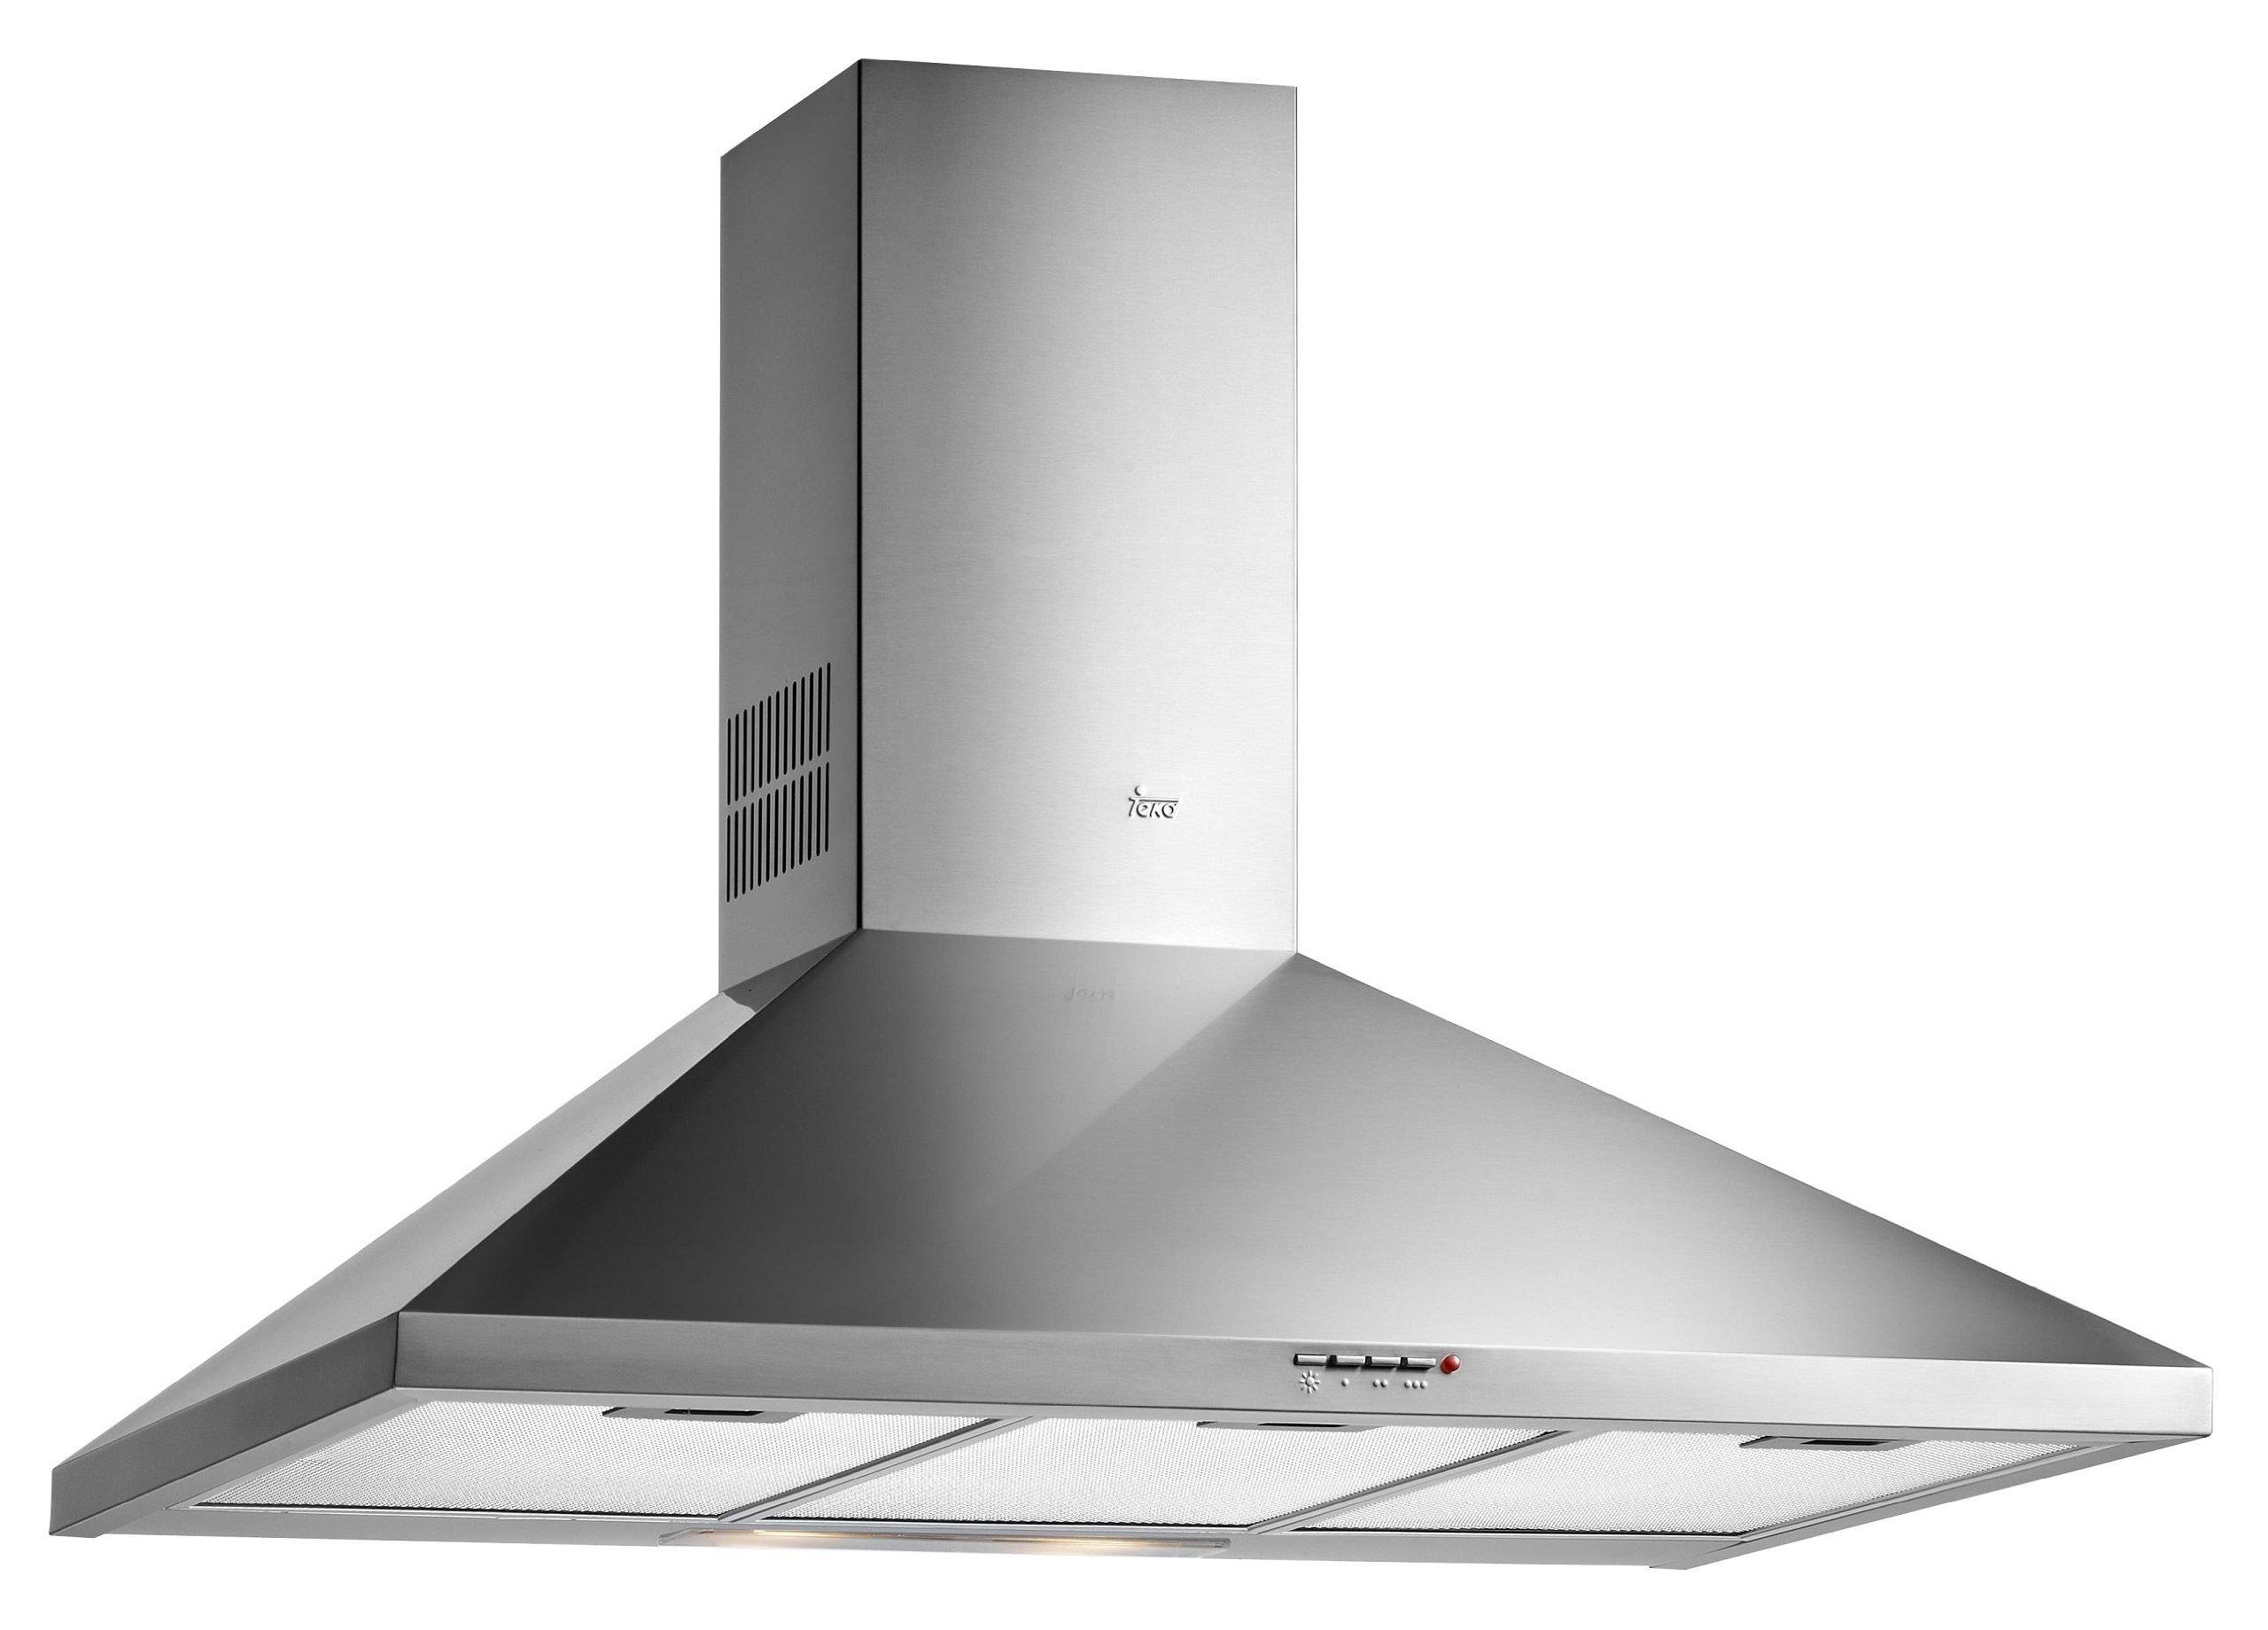 Teka DBB 60/70/90 Campana DBB90X Decorativa INOX 90CMT E, 40 W, 3 Velocidades, Acero inoxidable: Amazon.es: Grandes electrodomésticos